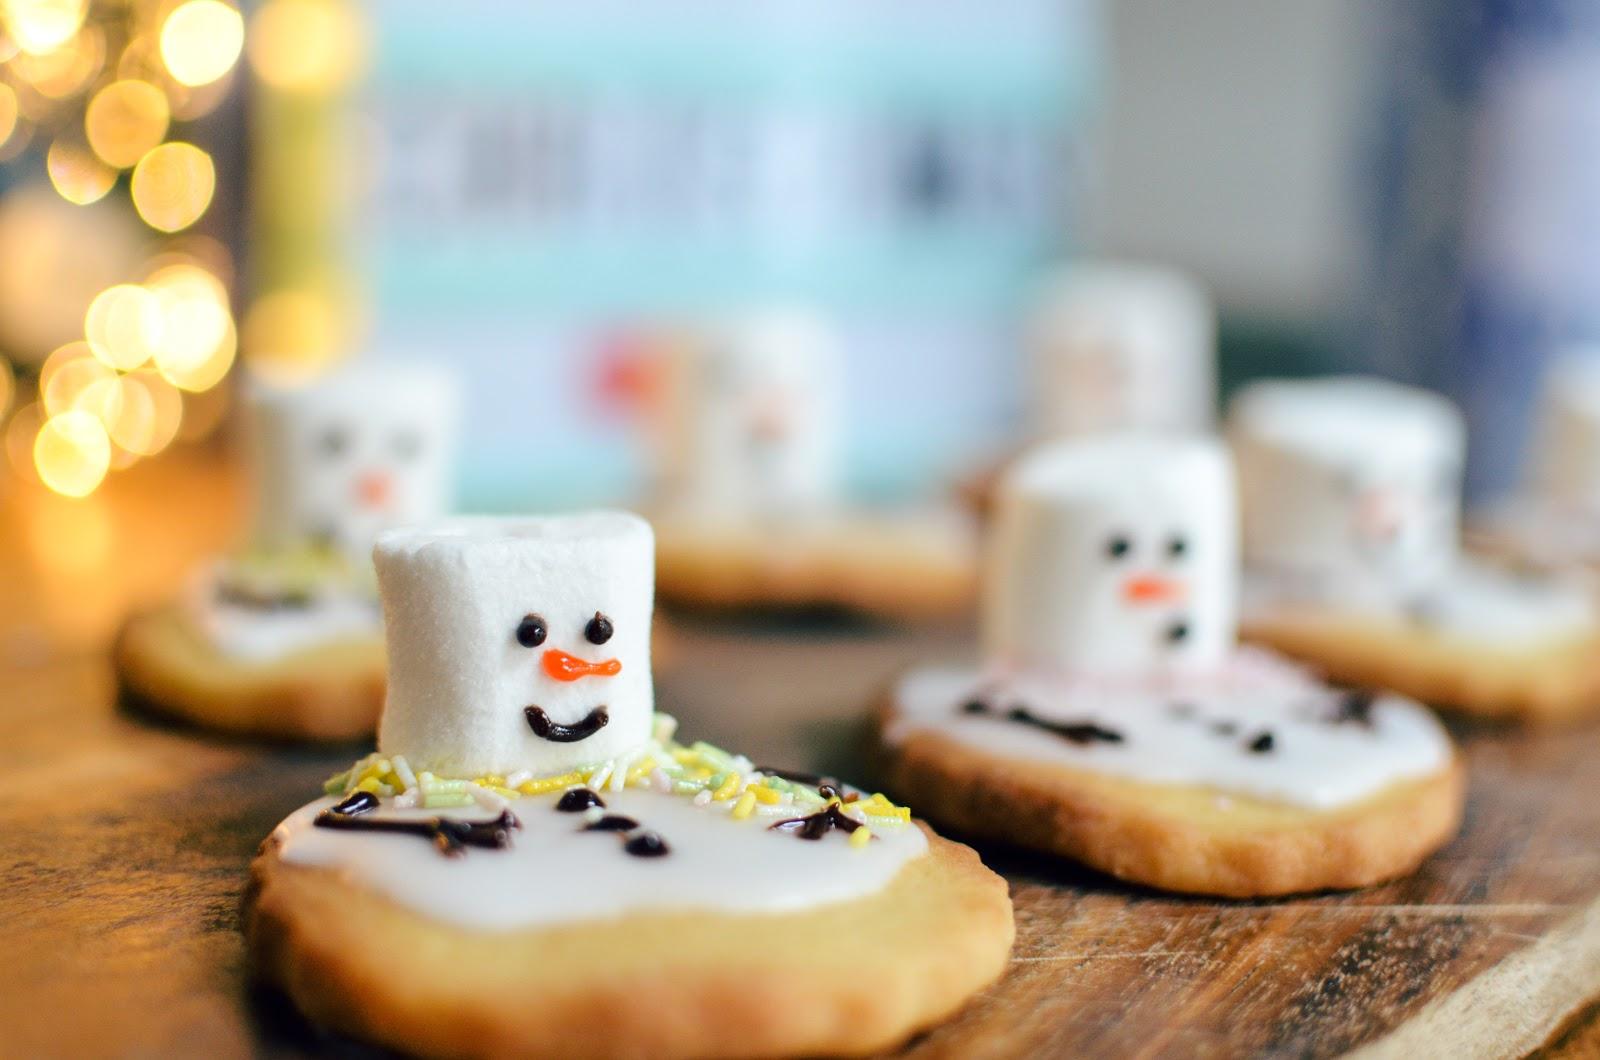 Christmas Baking: Tanya Burr's Snowmen Biscuits